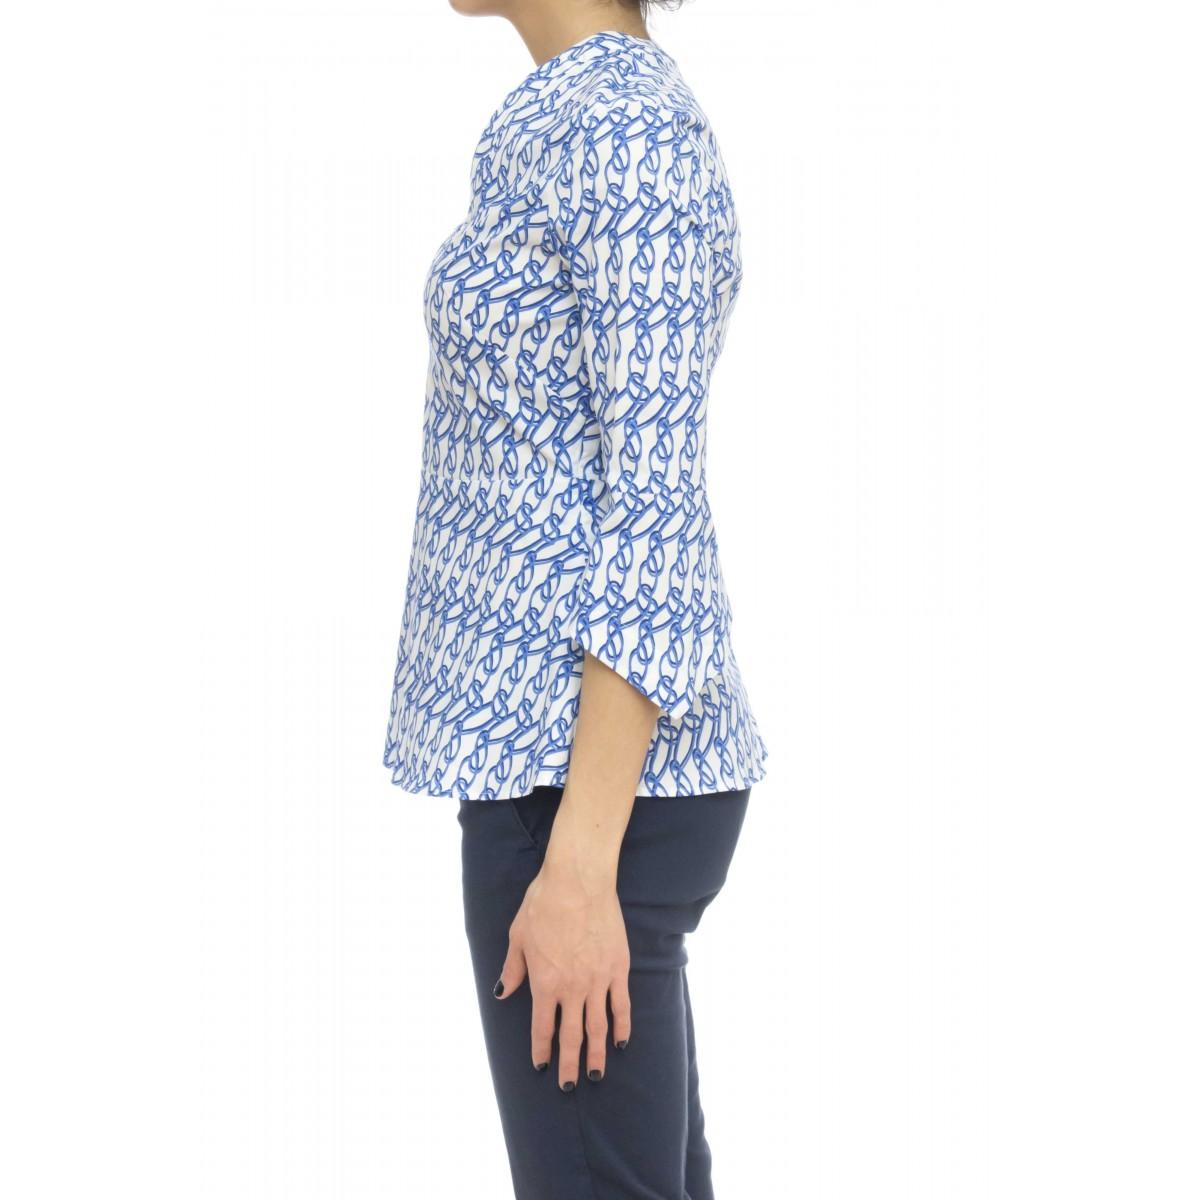 Camicia donna - Pjf zyt strech